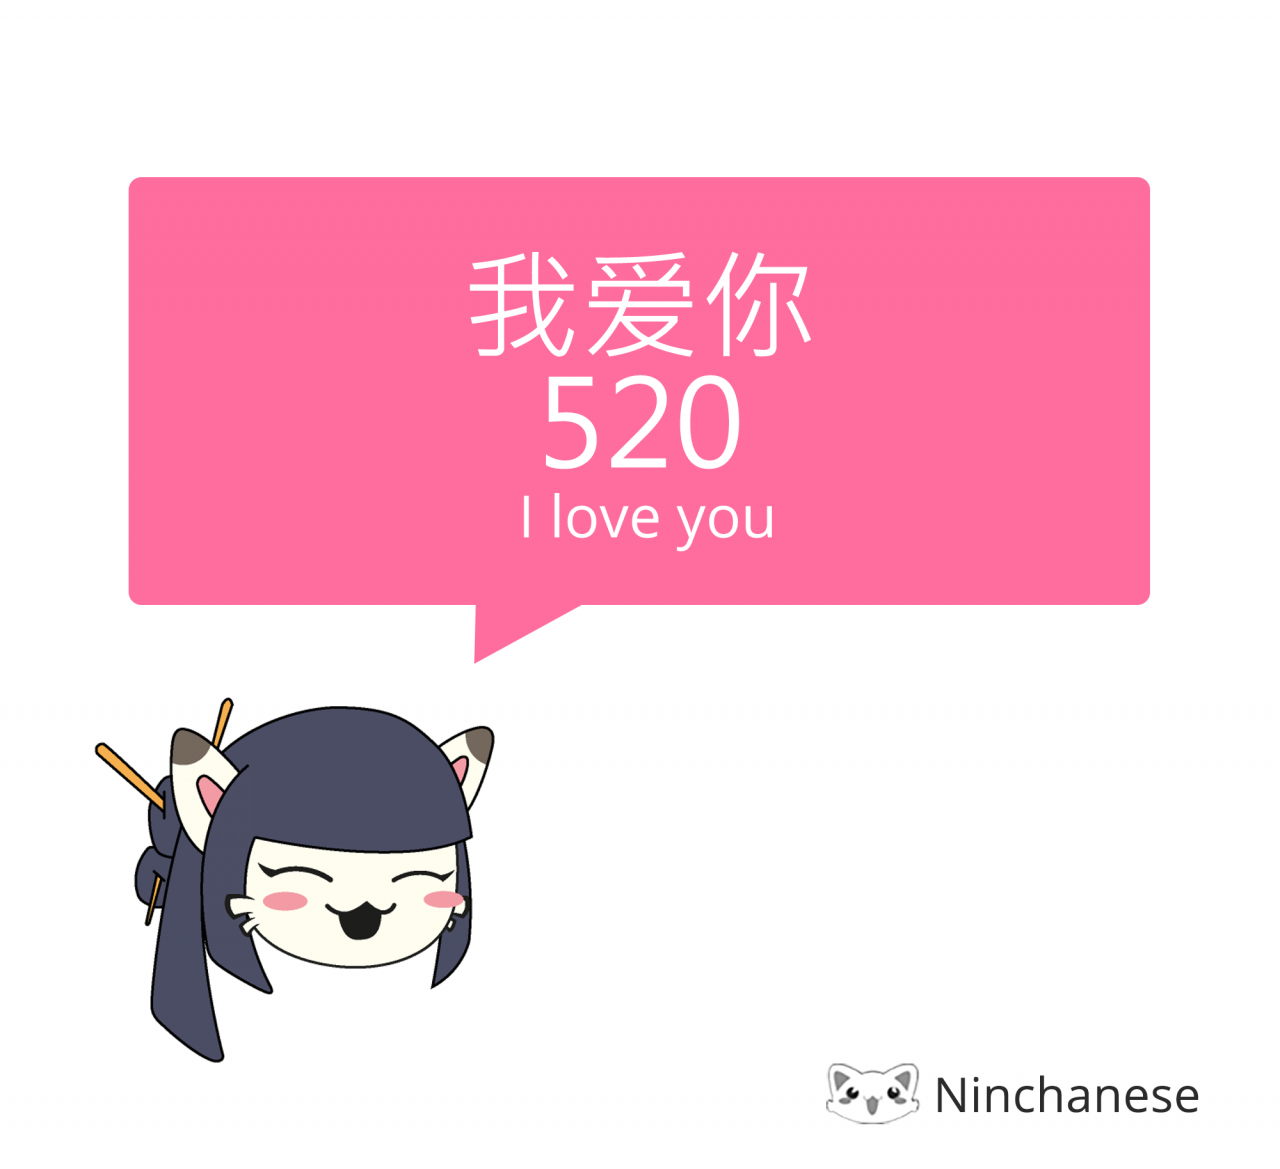 Ninchanese Blog